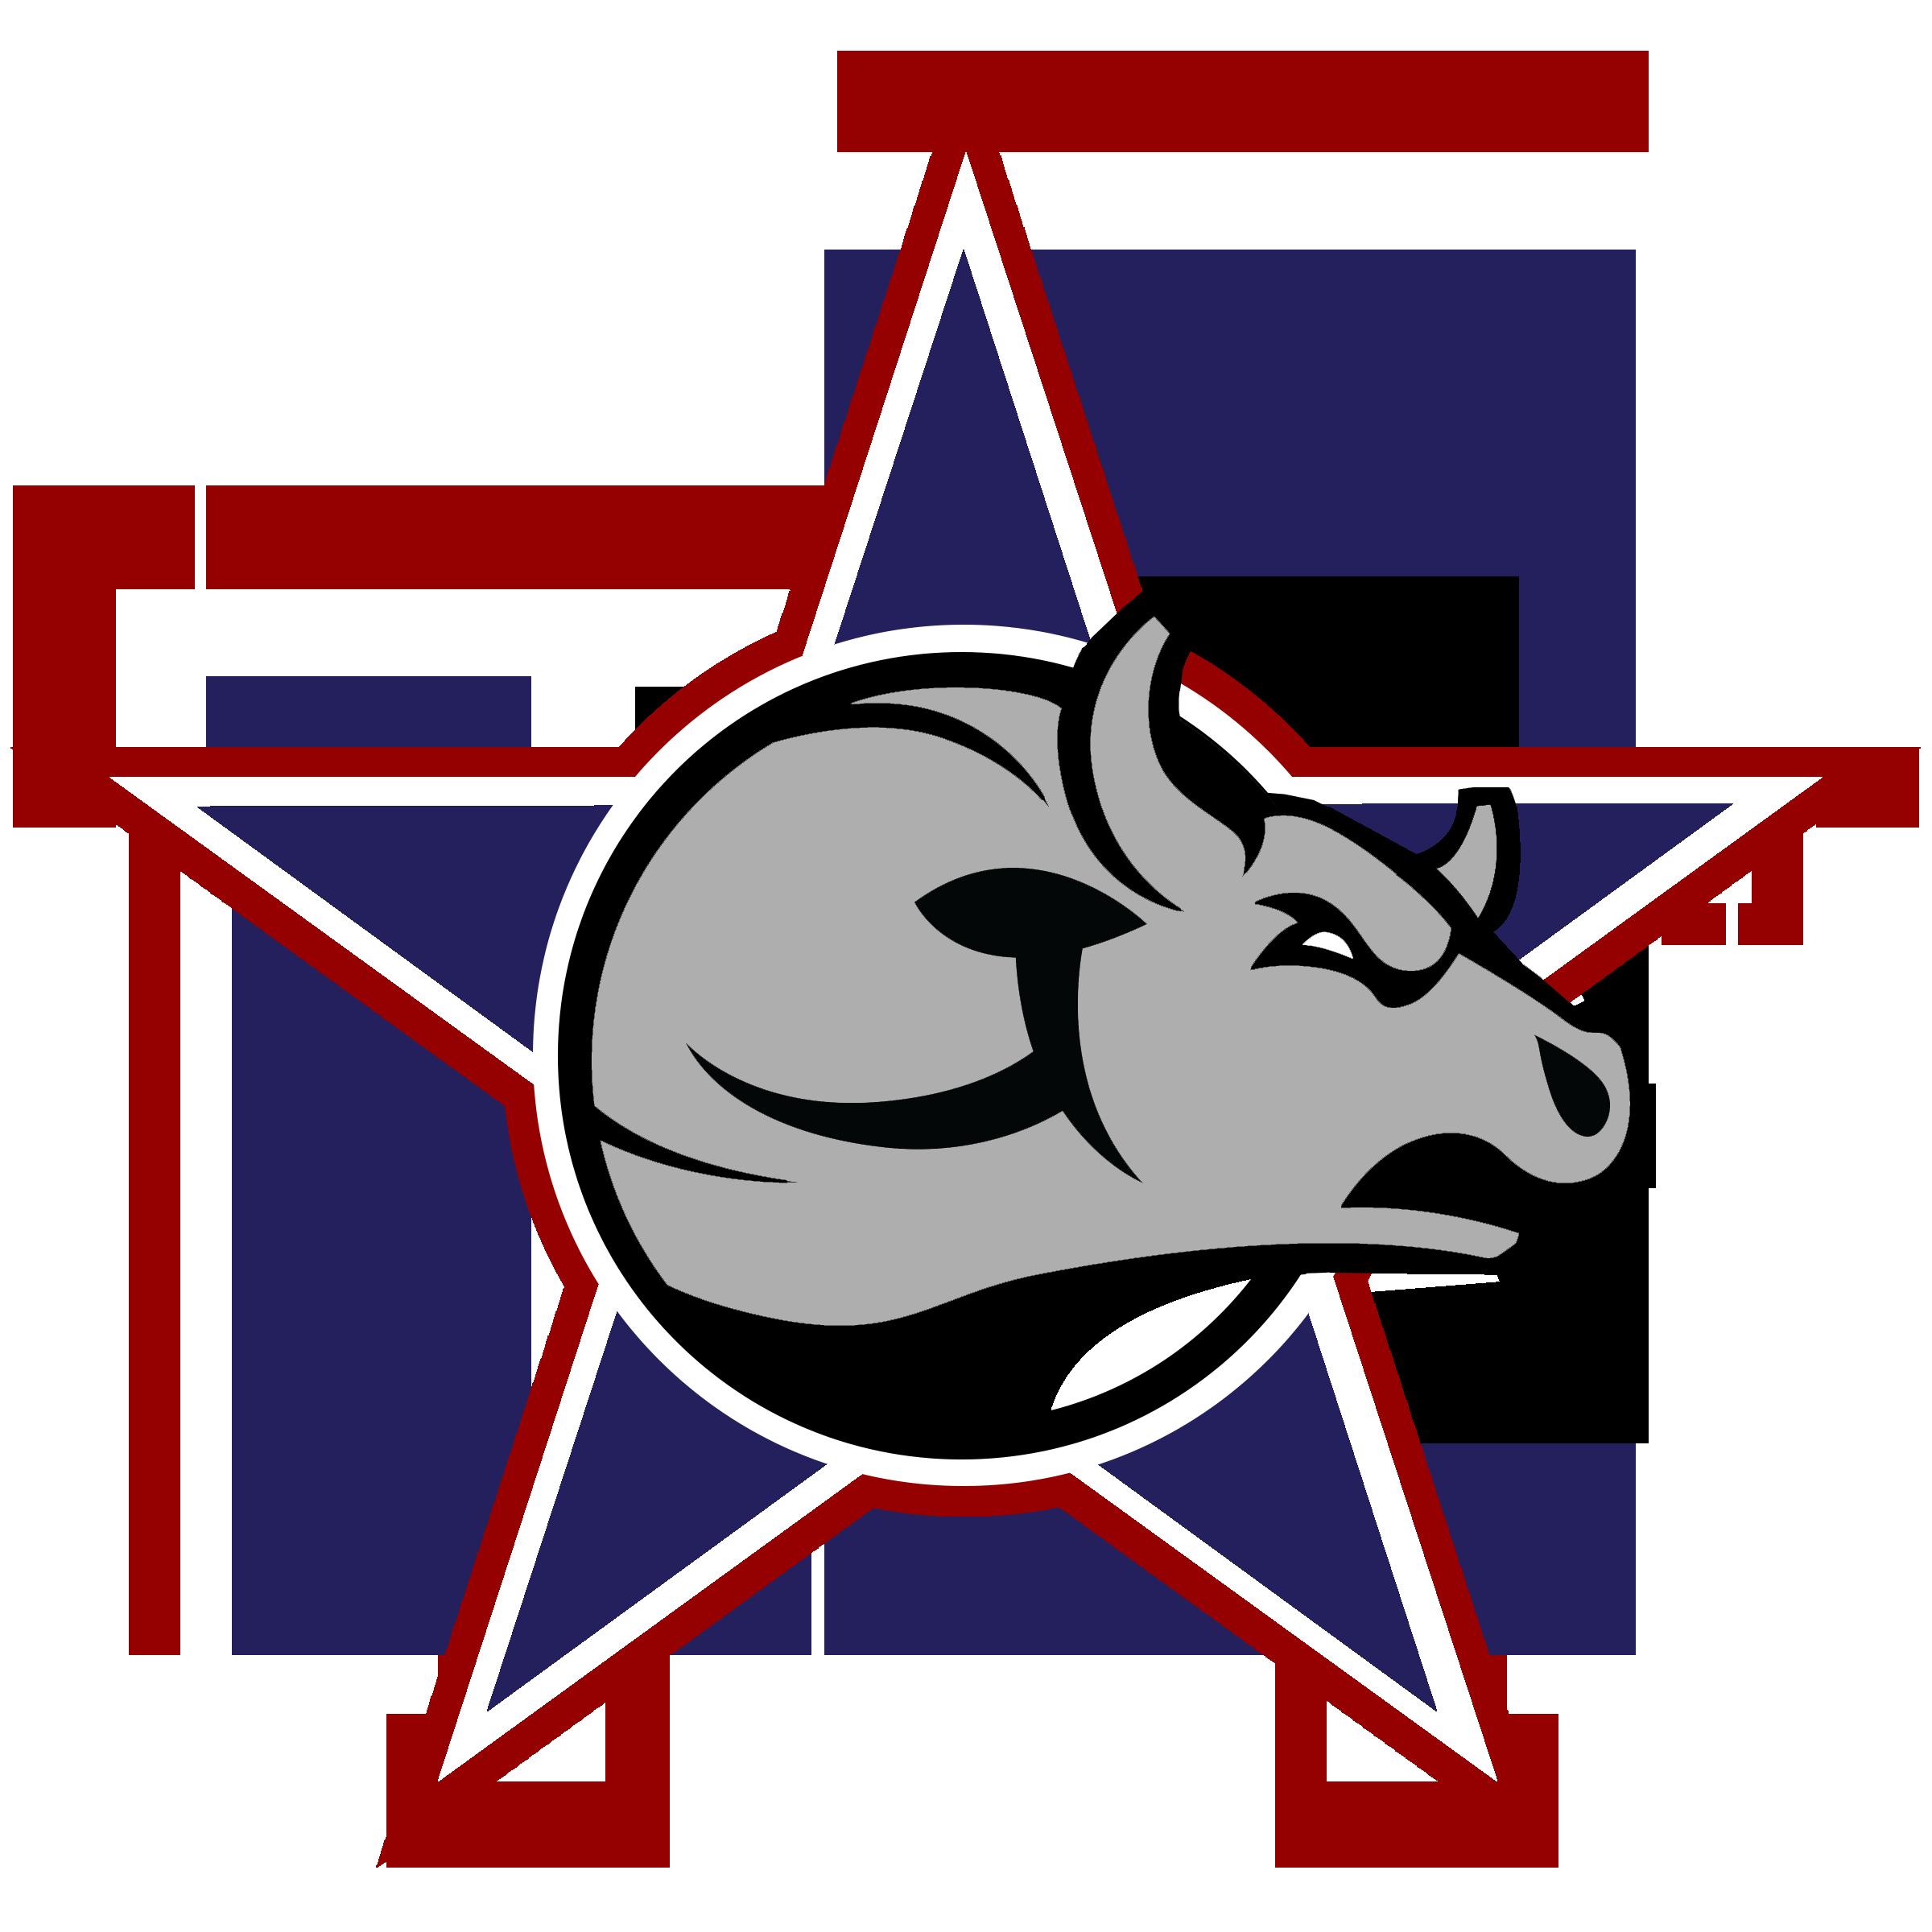 bucking bull drawing at getdrawings com free for personal use rh getdrawings com free rodeo clipart images